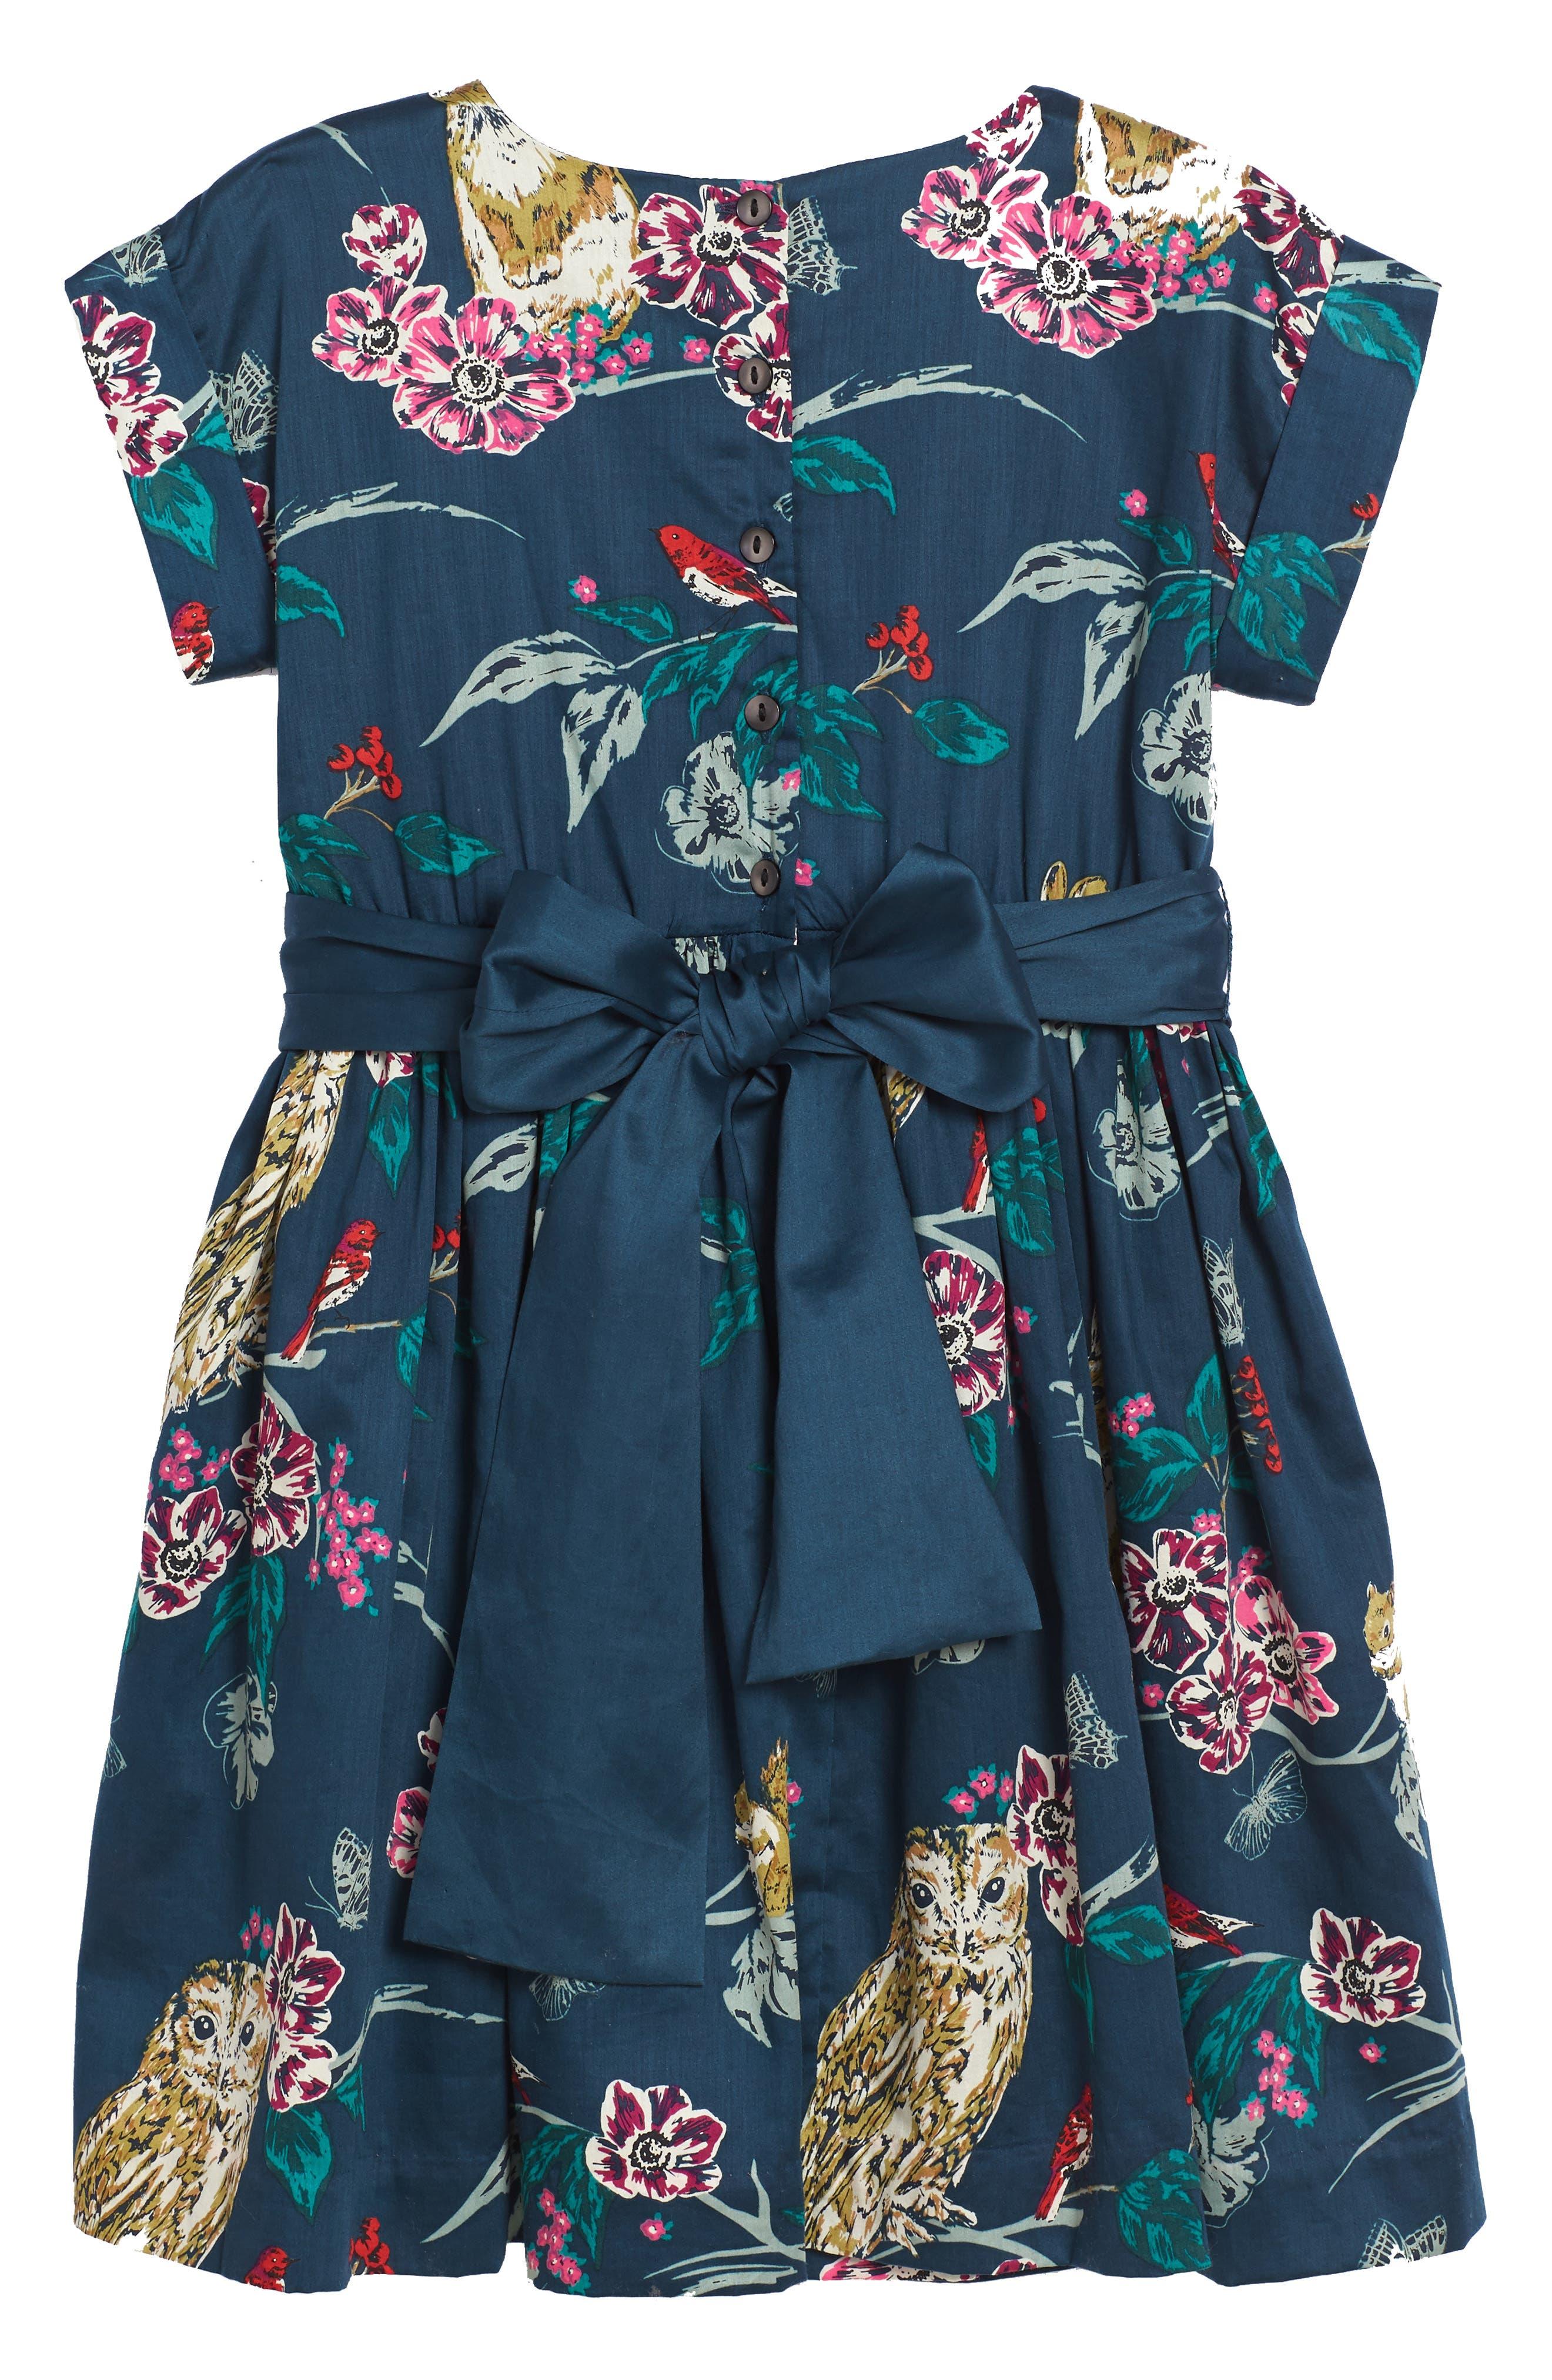 Alternate Image 3  - Tea Collection Caledonian Forest Sash Dress (Toddler Girls, Little Girls & Big Girls)